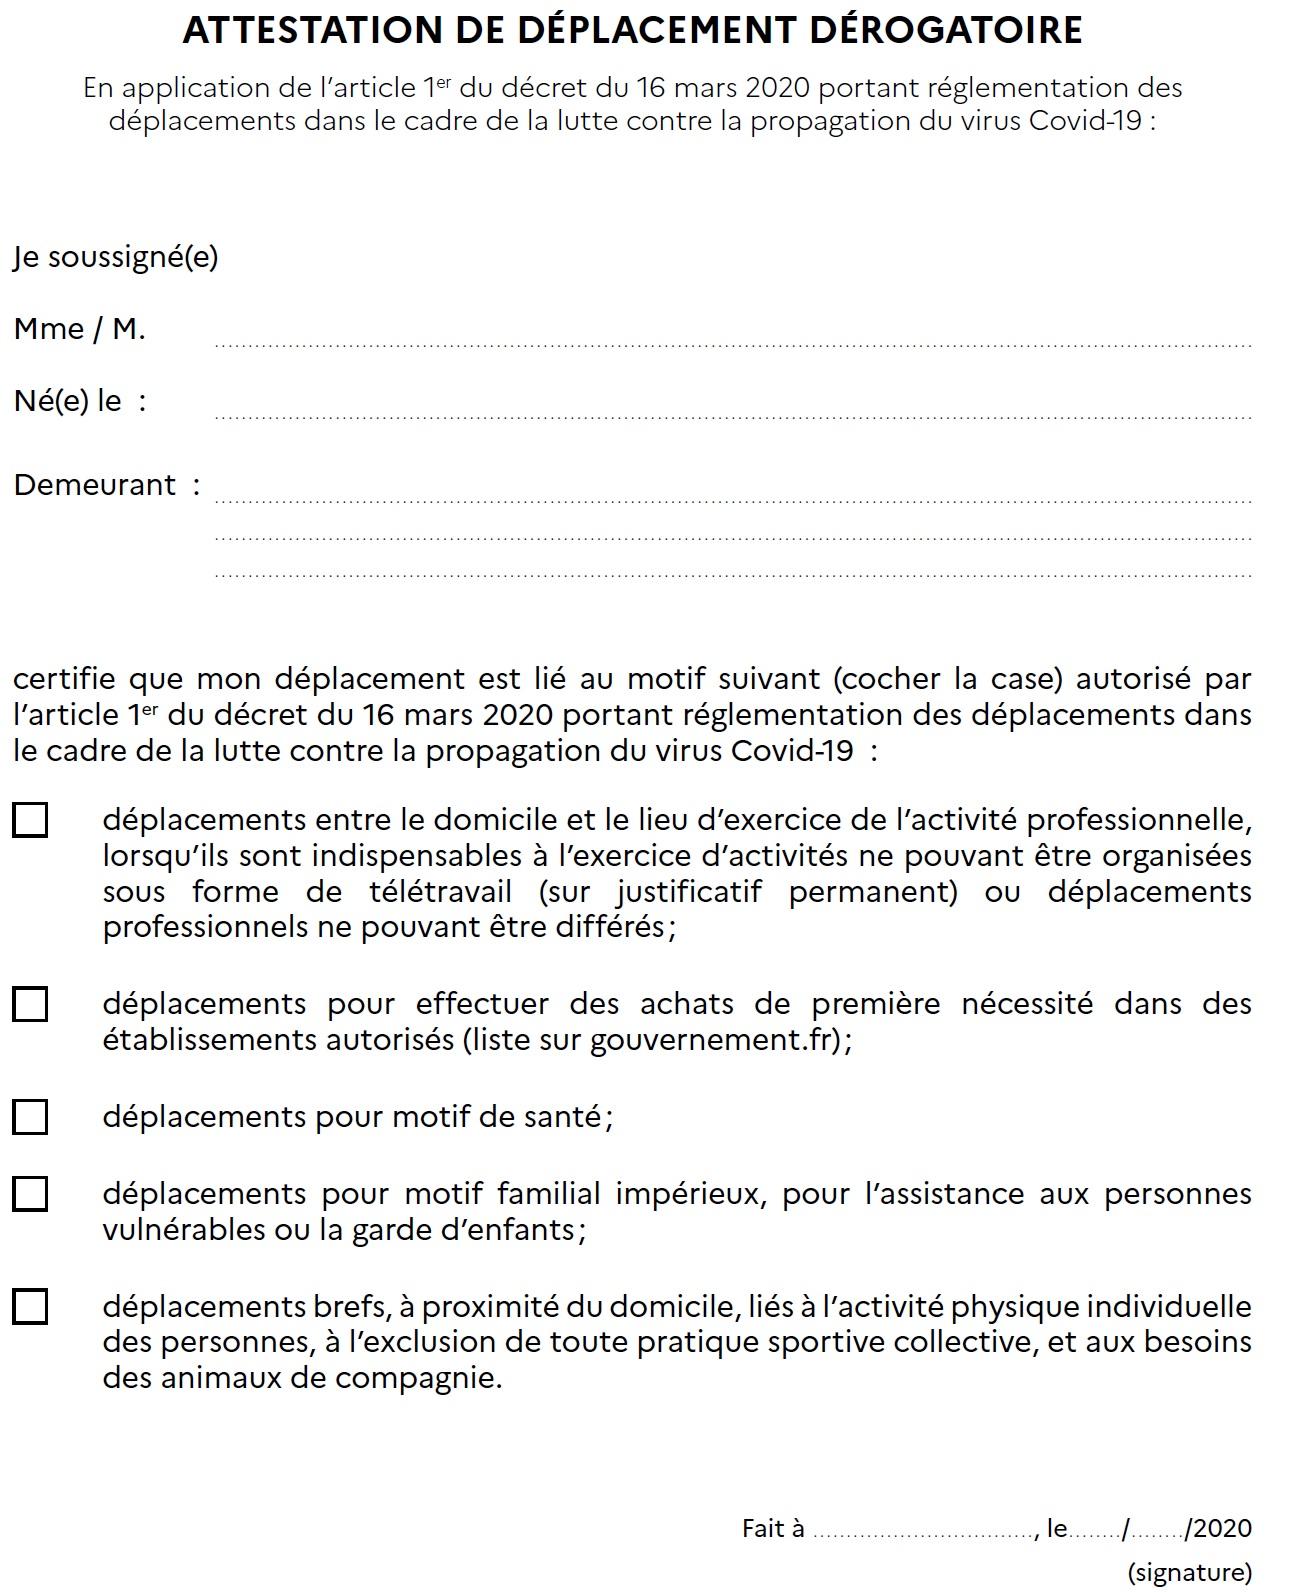 ATTESTATION SORTIE CORONA VIRUS - Truffi-conseils-covid-19-1 / Attestation dérogatoire de sortie